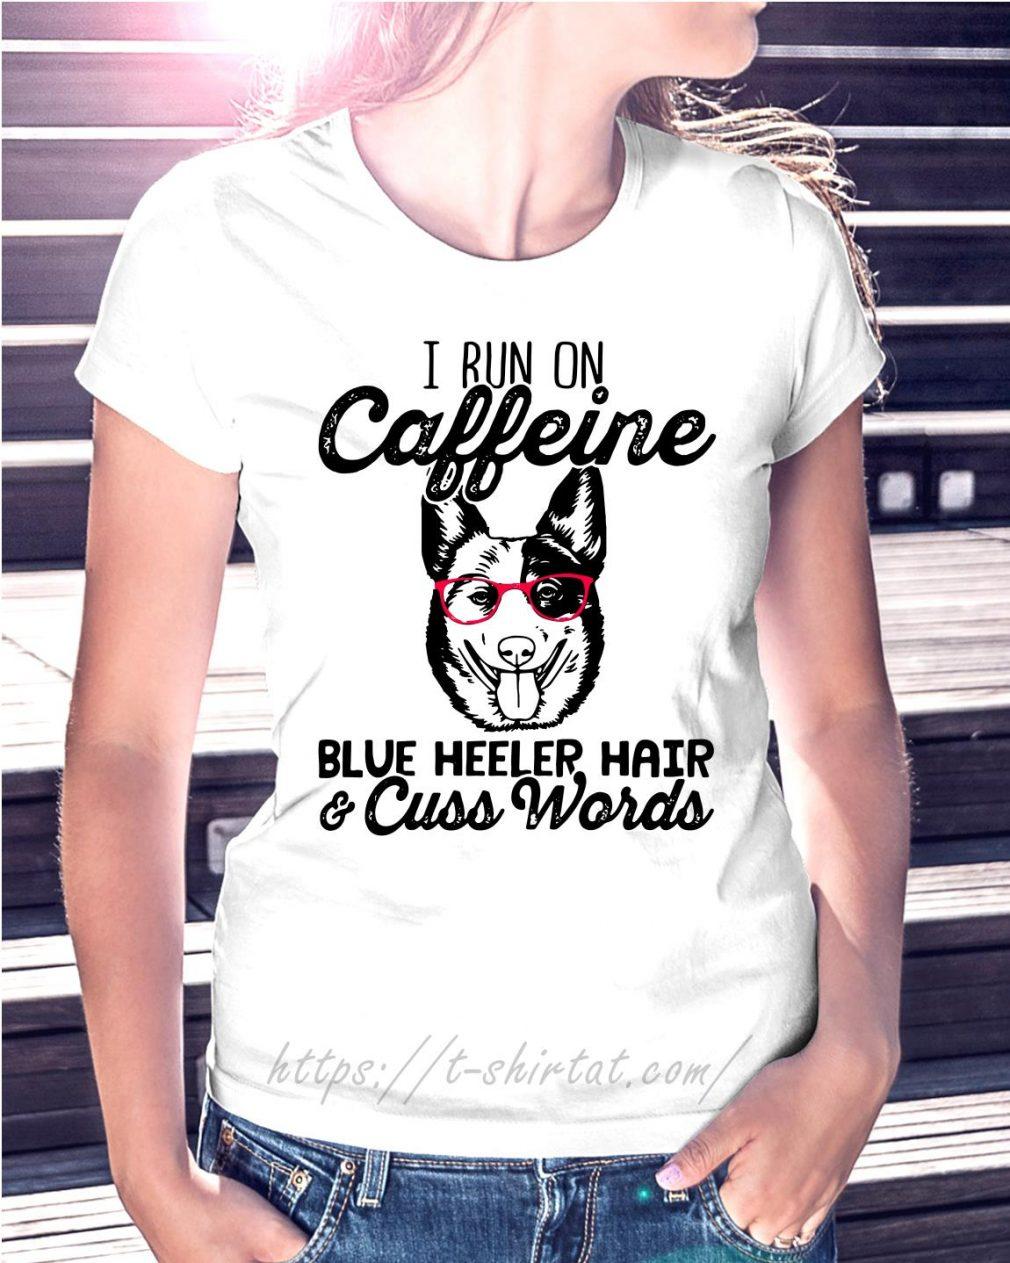 I run on Caffeine blue heeler hair and cuss words Ladies Tee